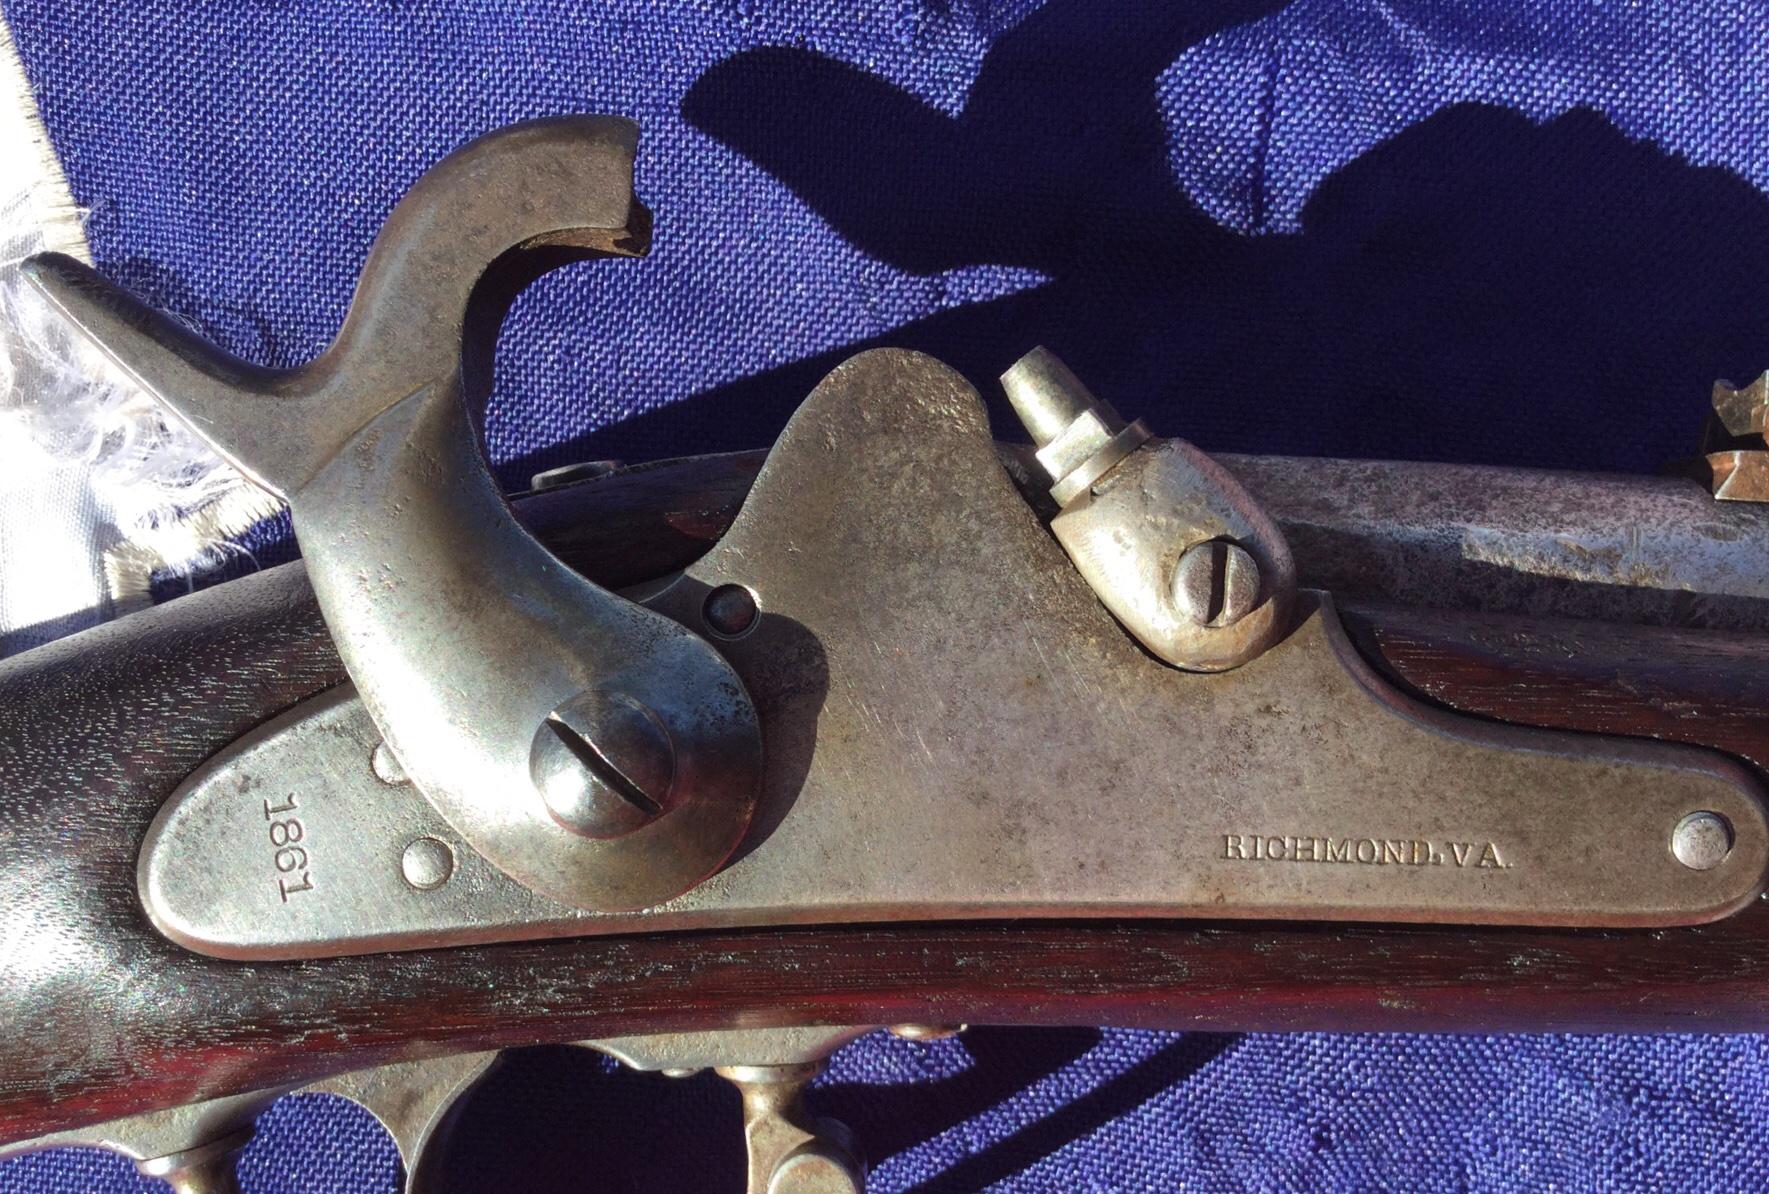 1861 Richmond Lock Plate, Full Cocked